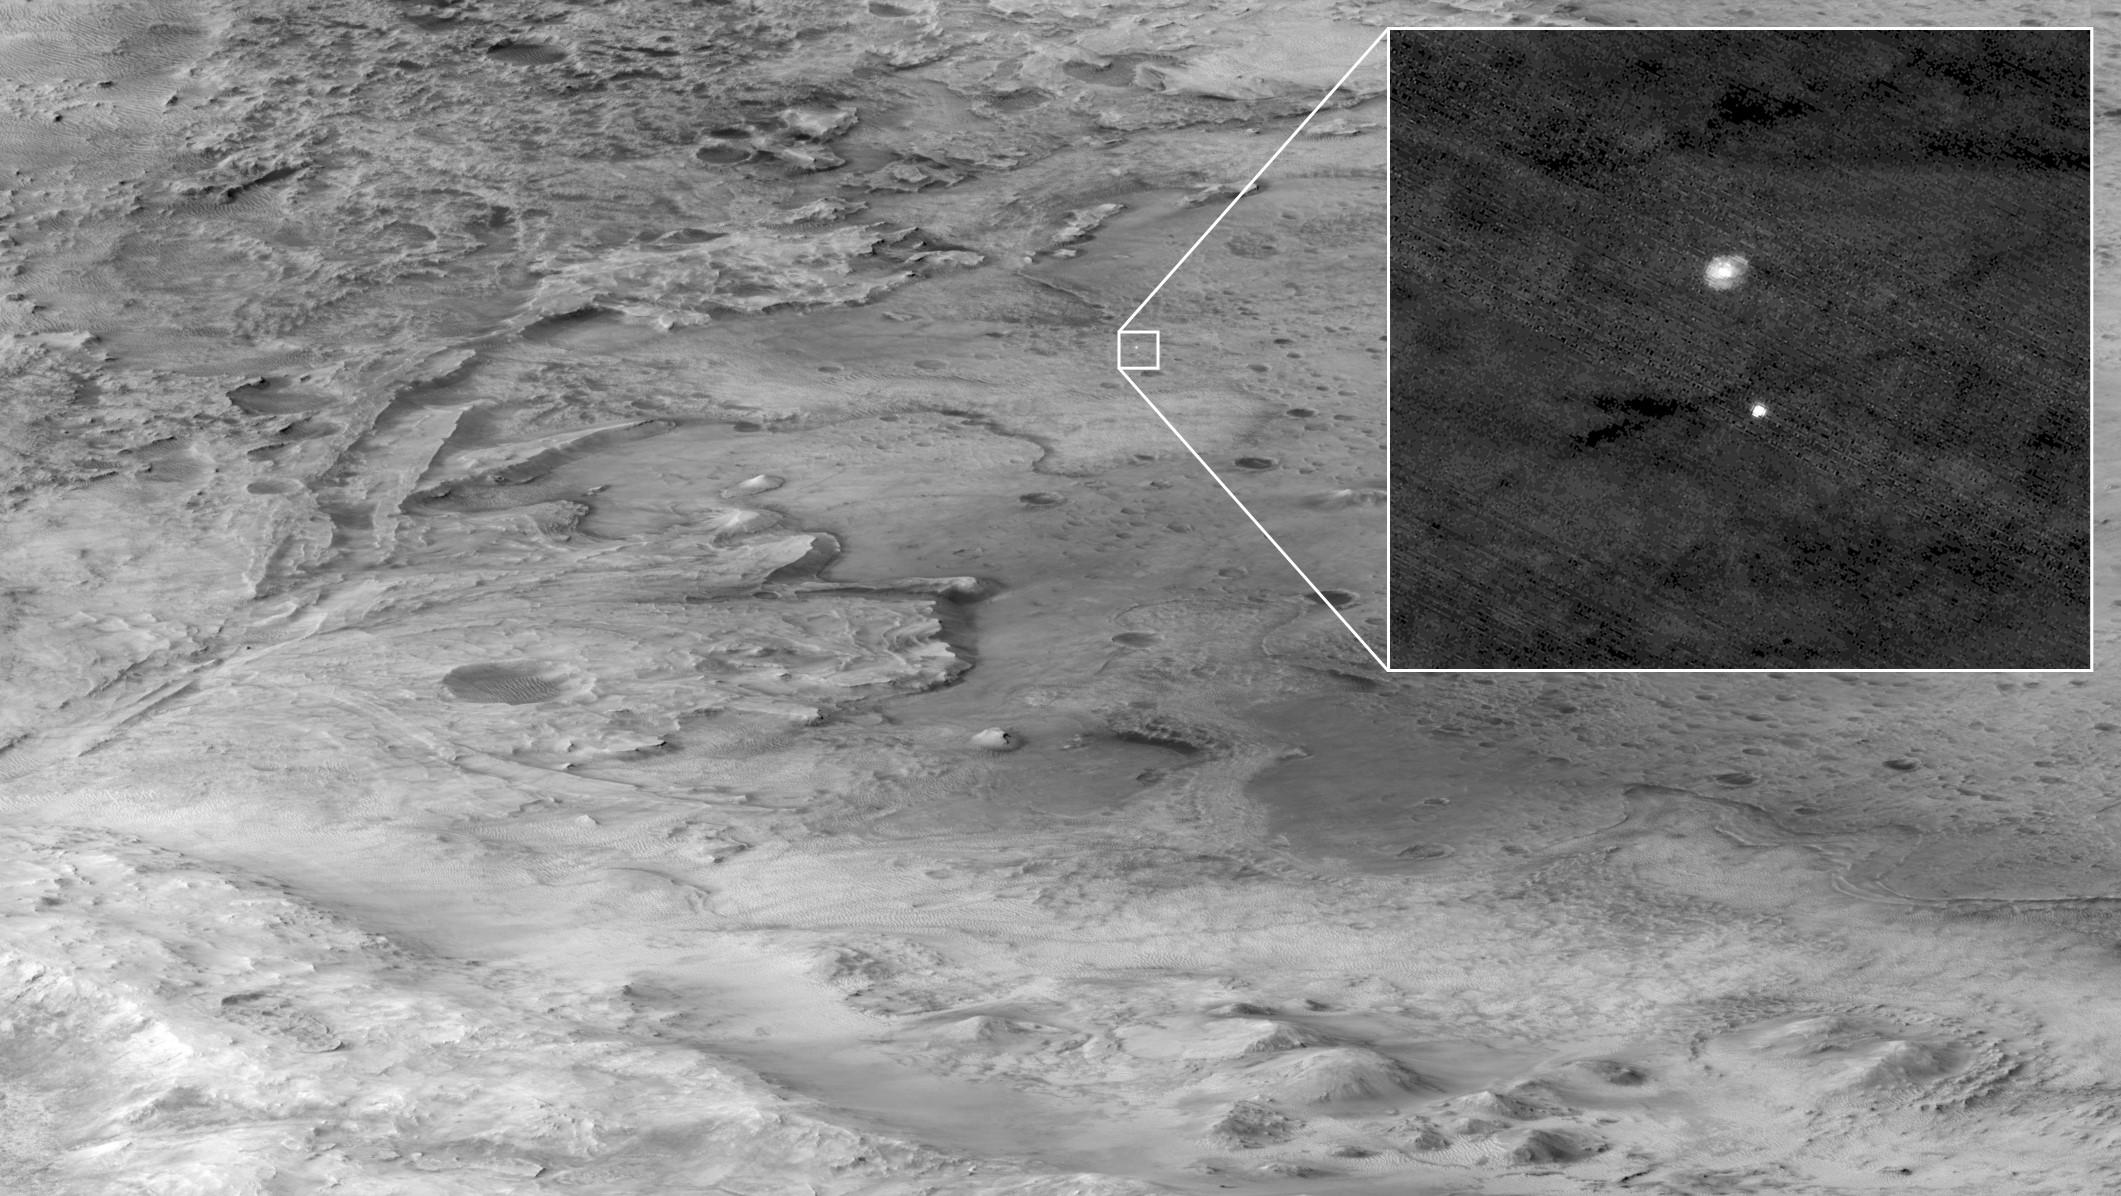 Процесс спуска марсохода, снимок с небесного экрана